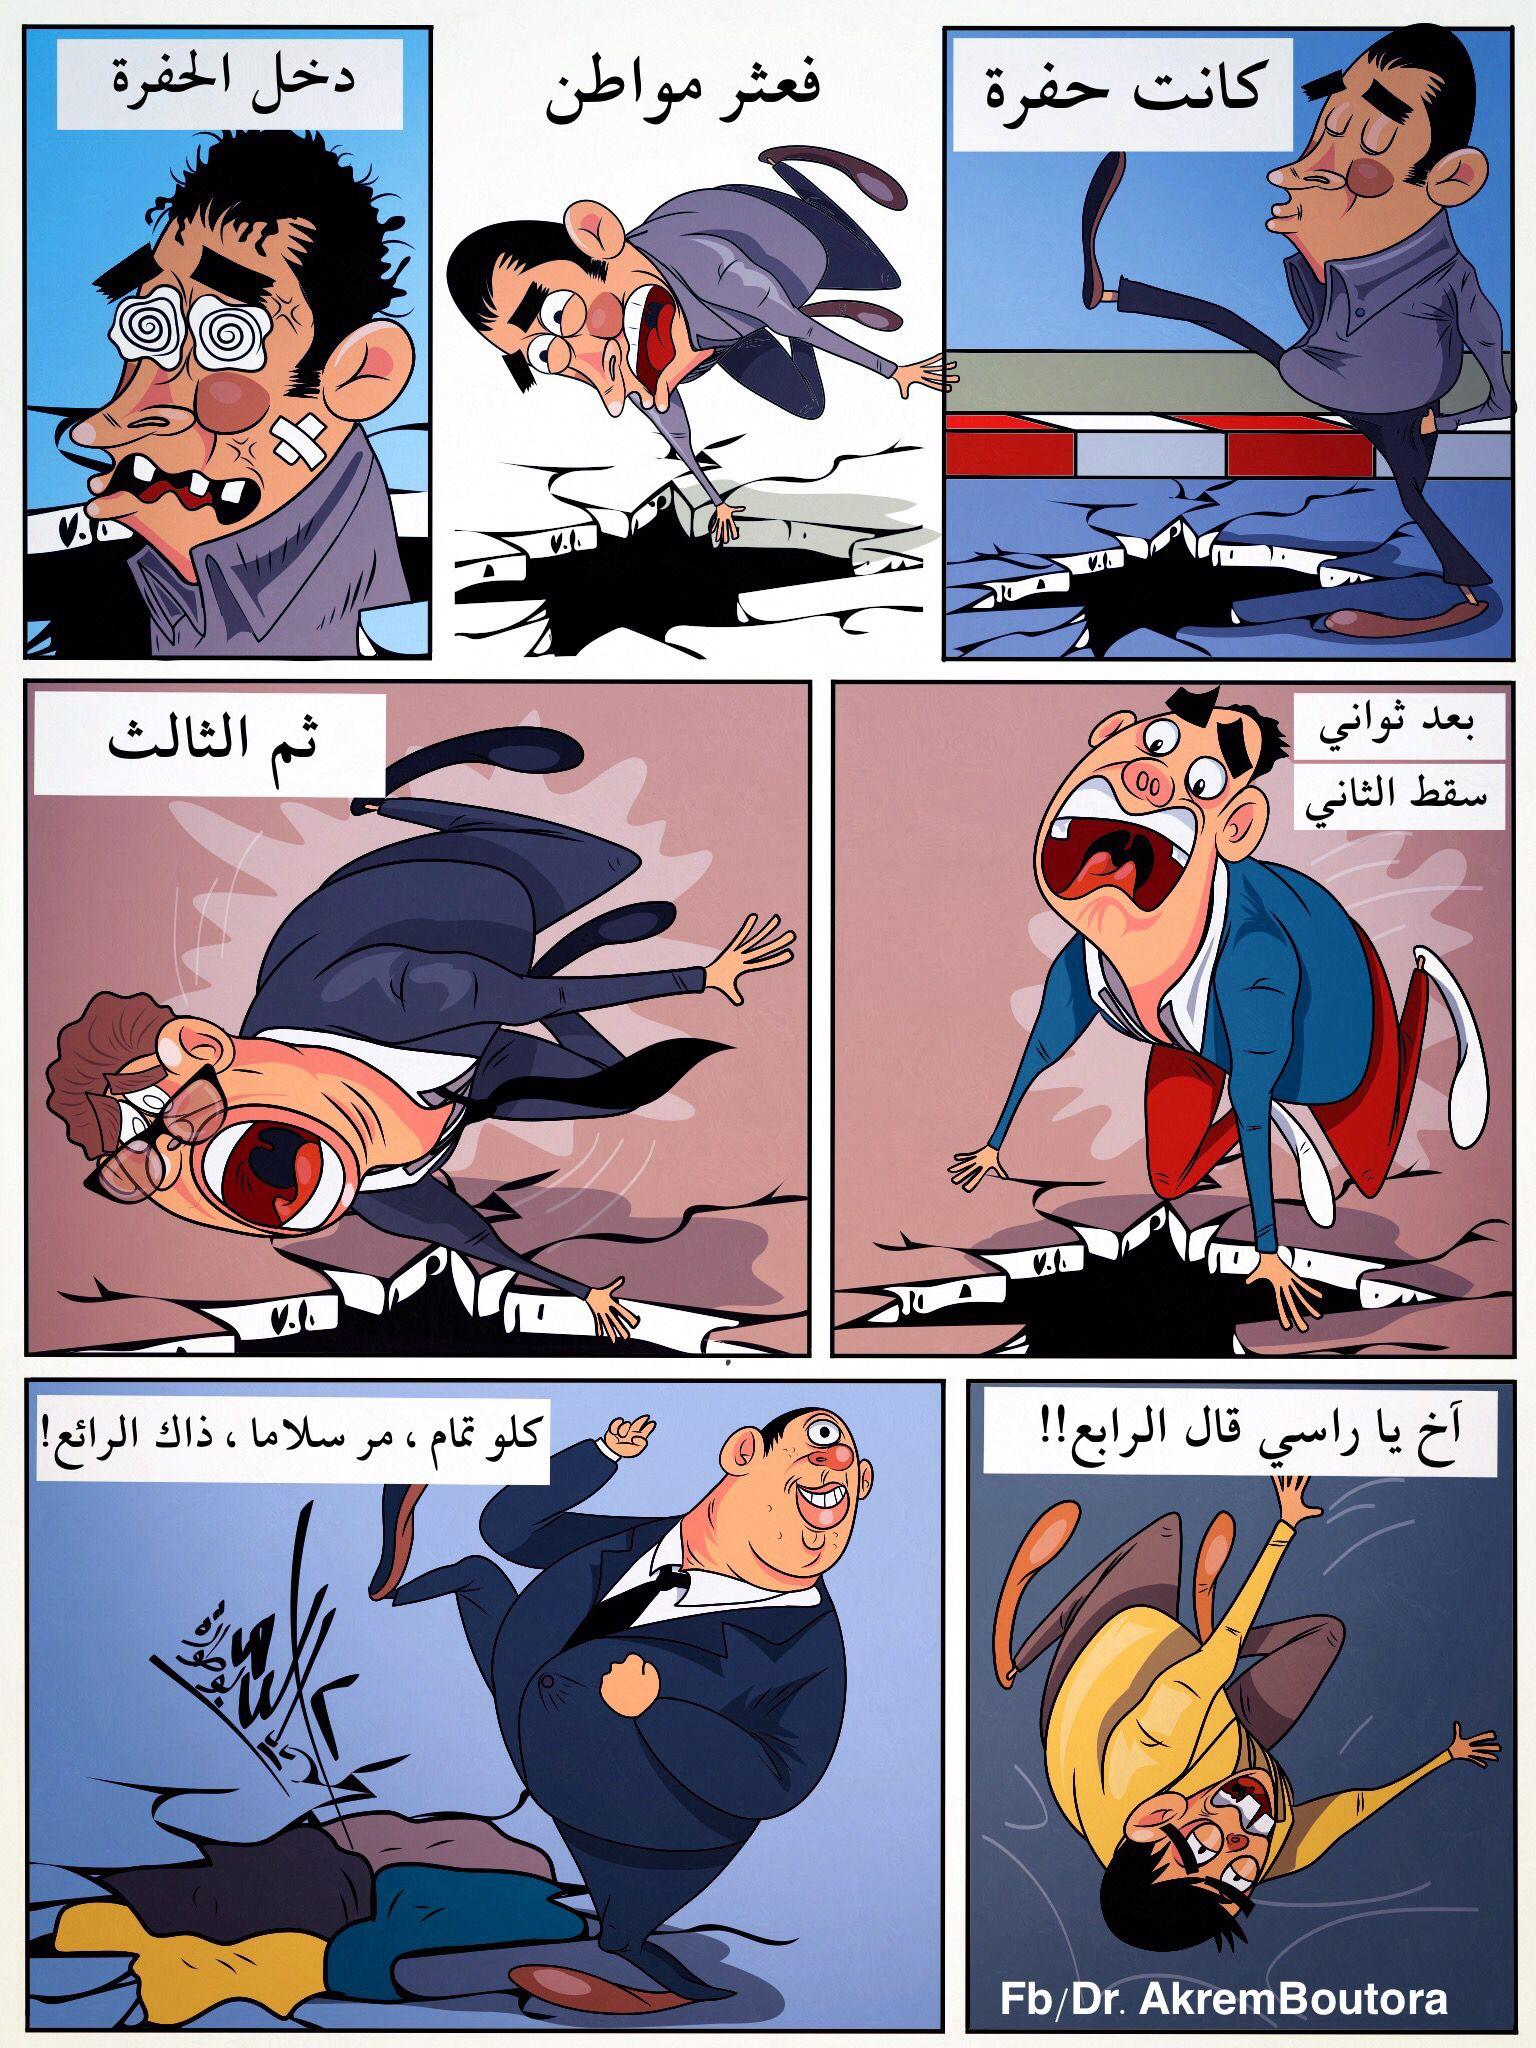 كاريكاتير بوطورة اكرم قصة قصيرة Comic Book Cover Comic Books Book Cover